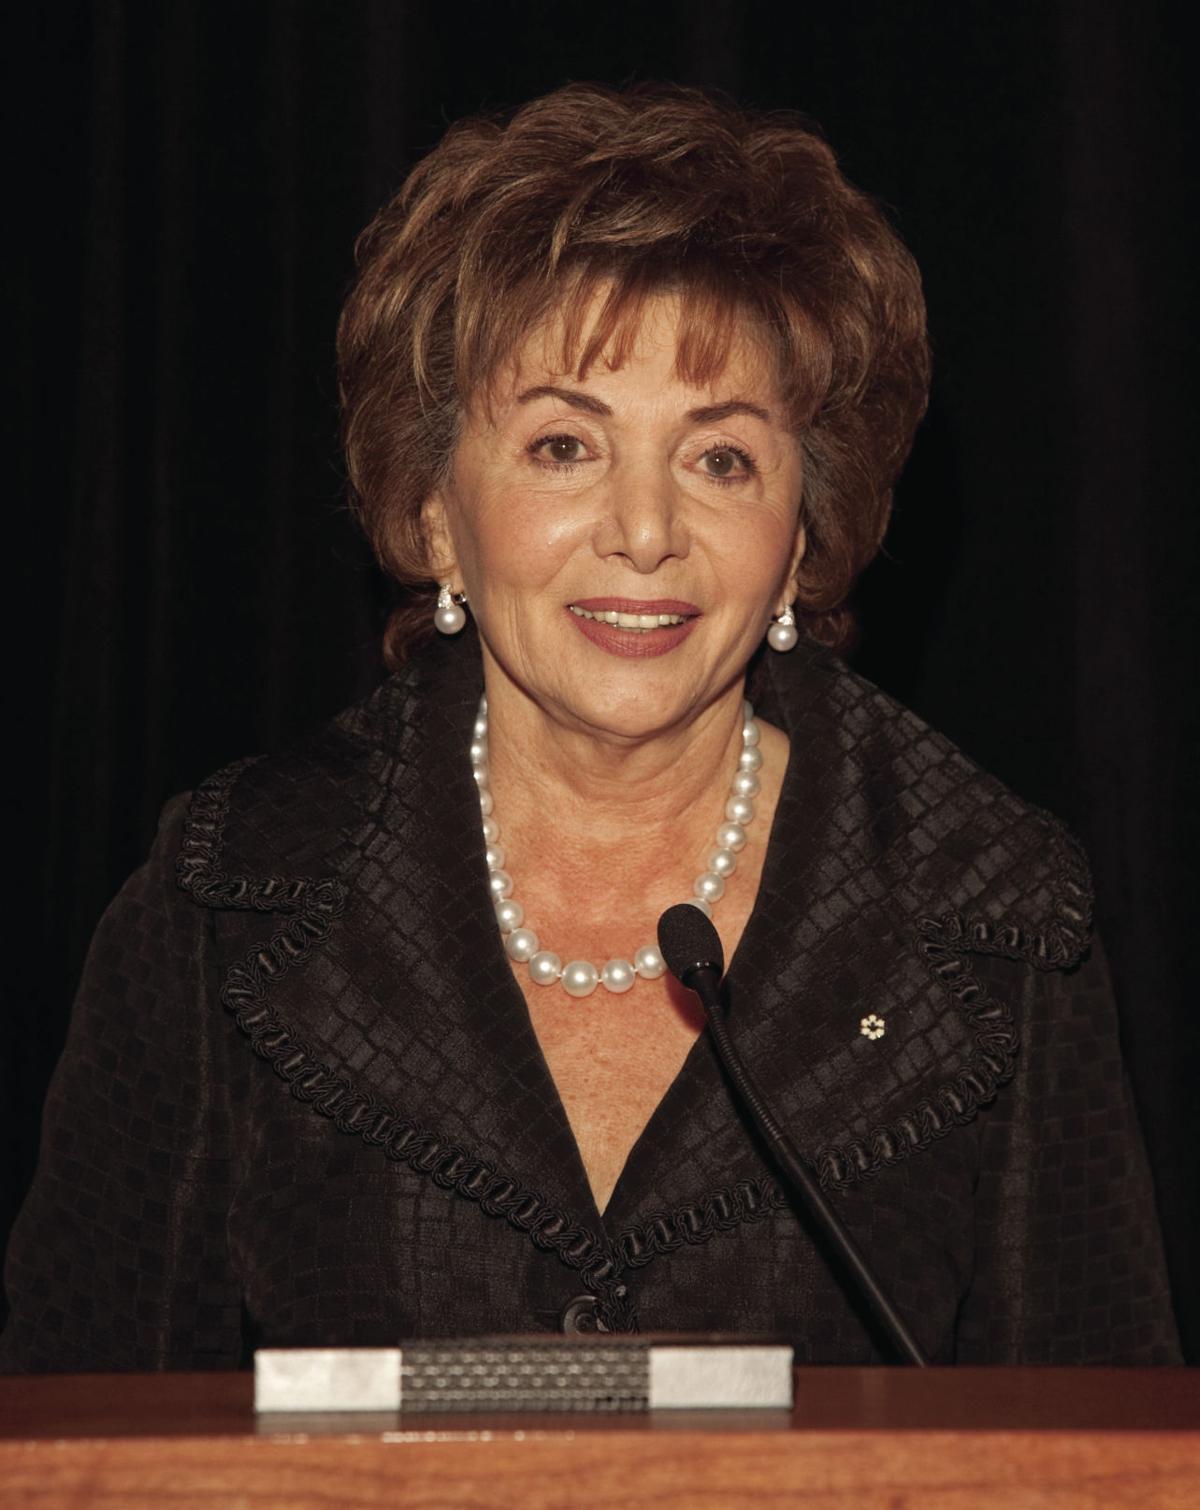 Barbara Seal